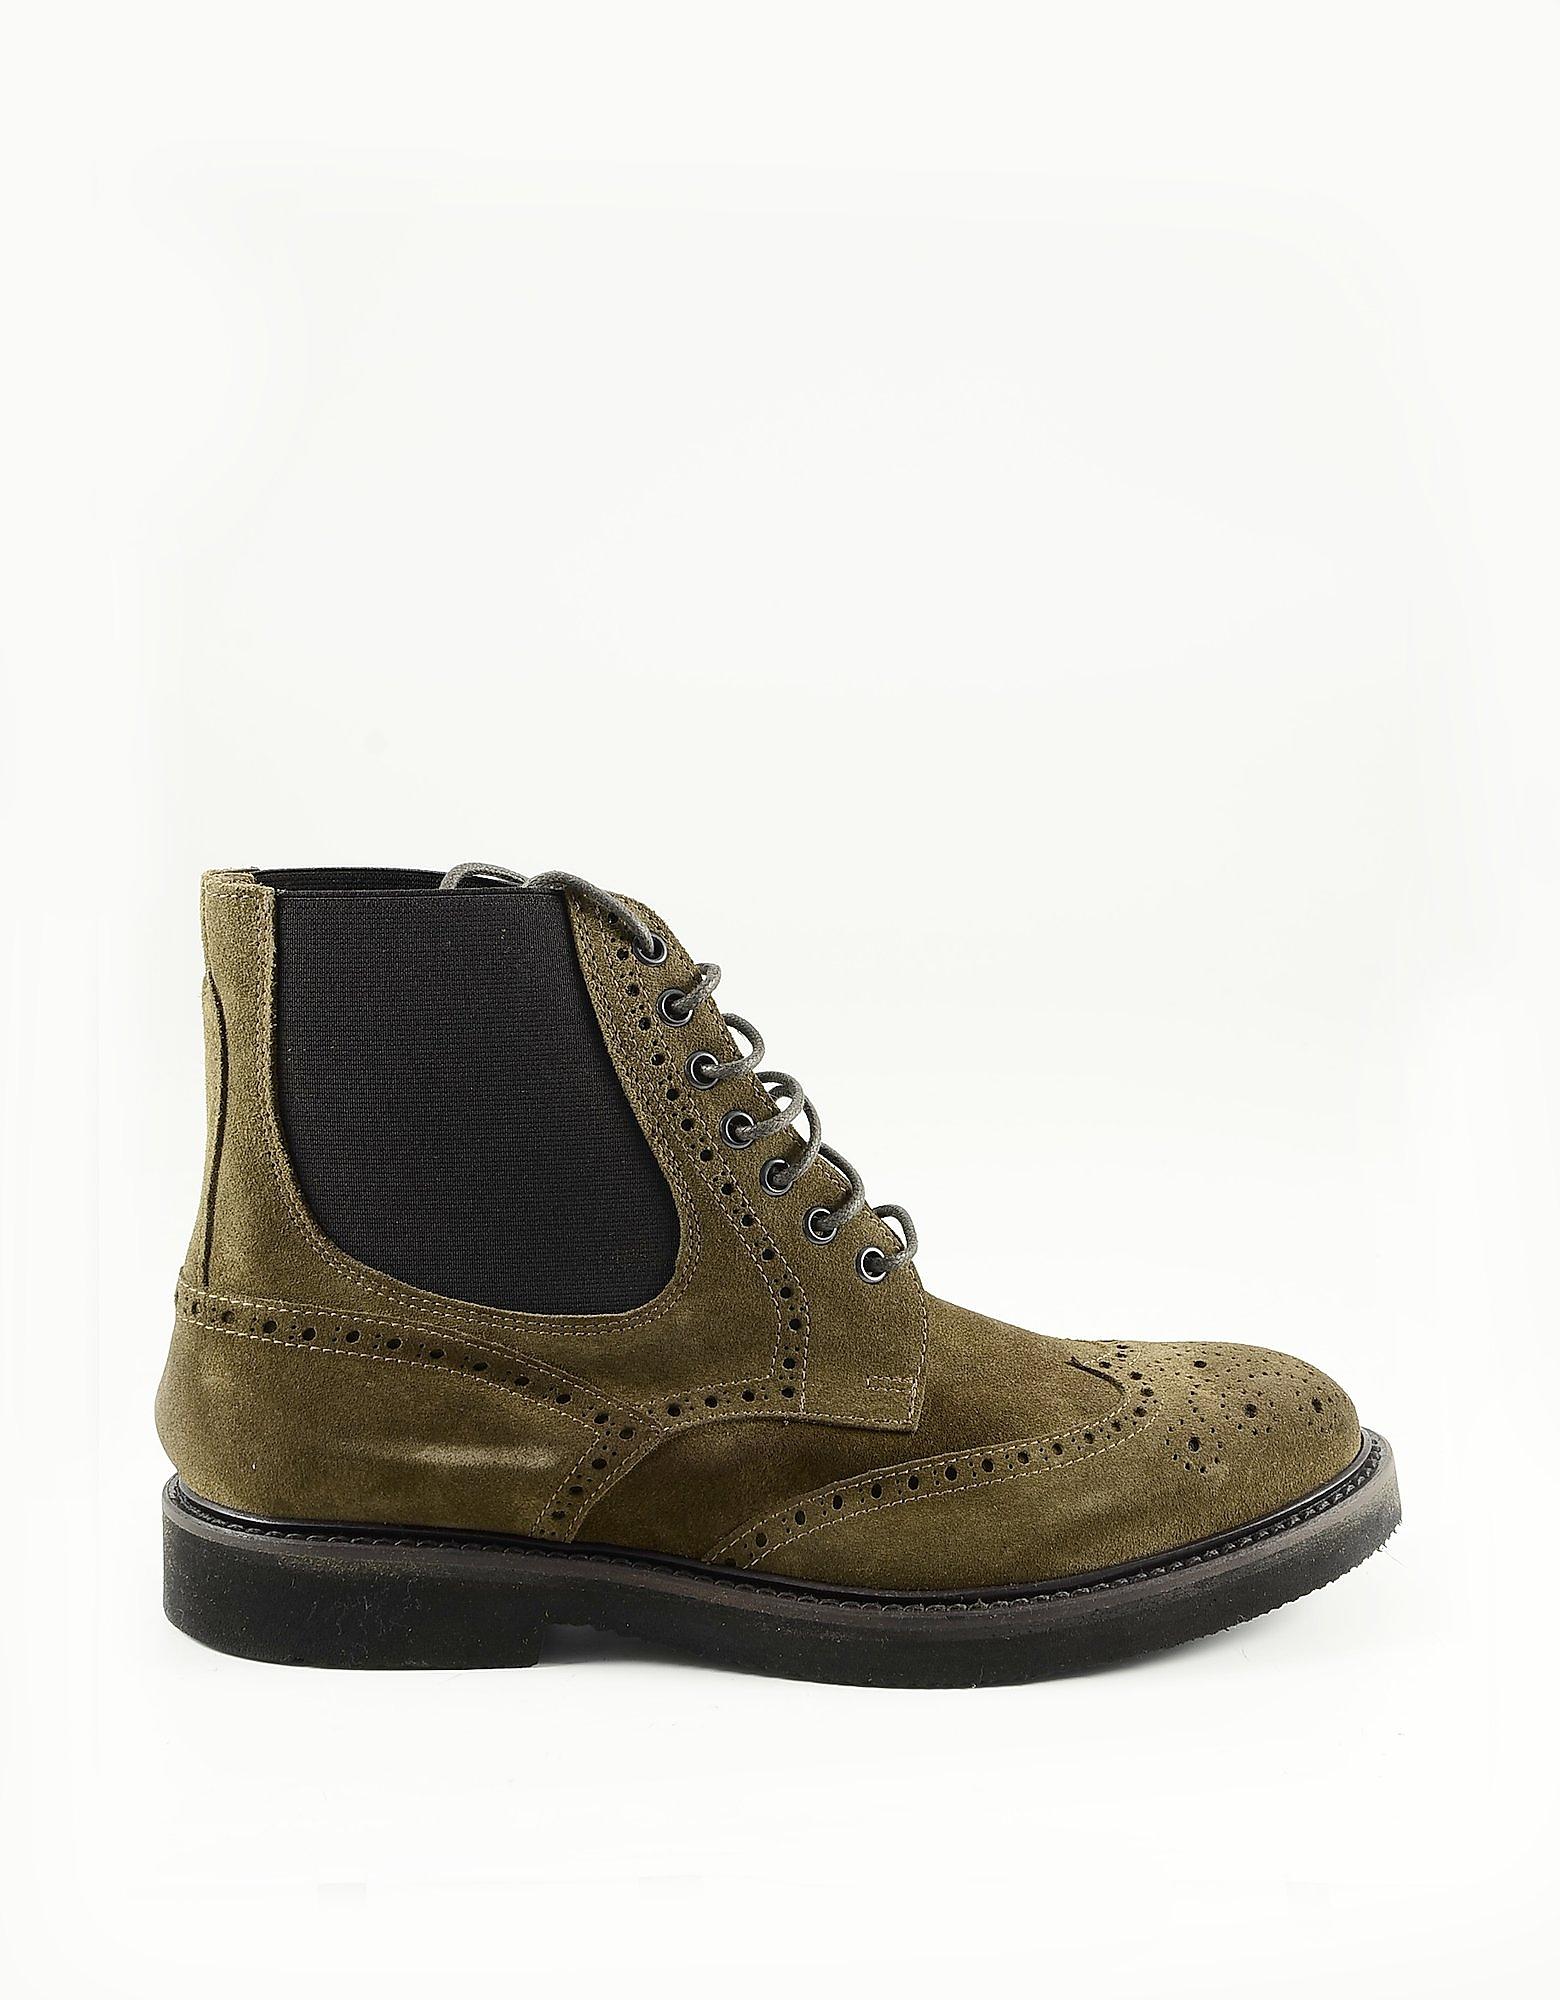 Eleventy Designer Shoes, Brown Suede Men's Derby Boots